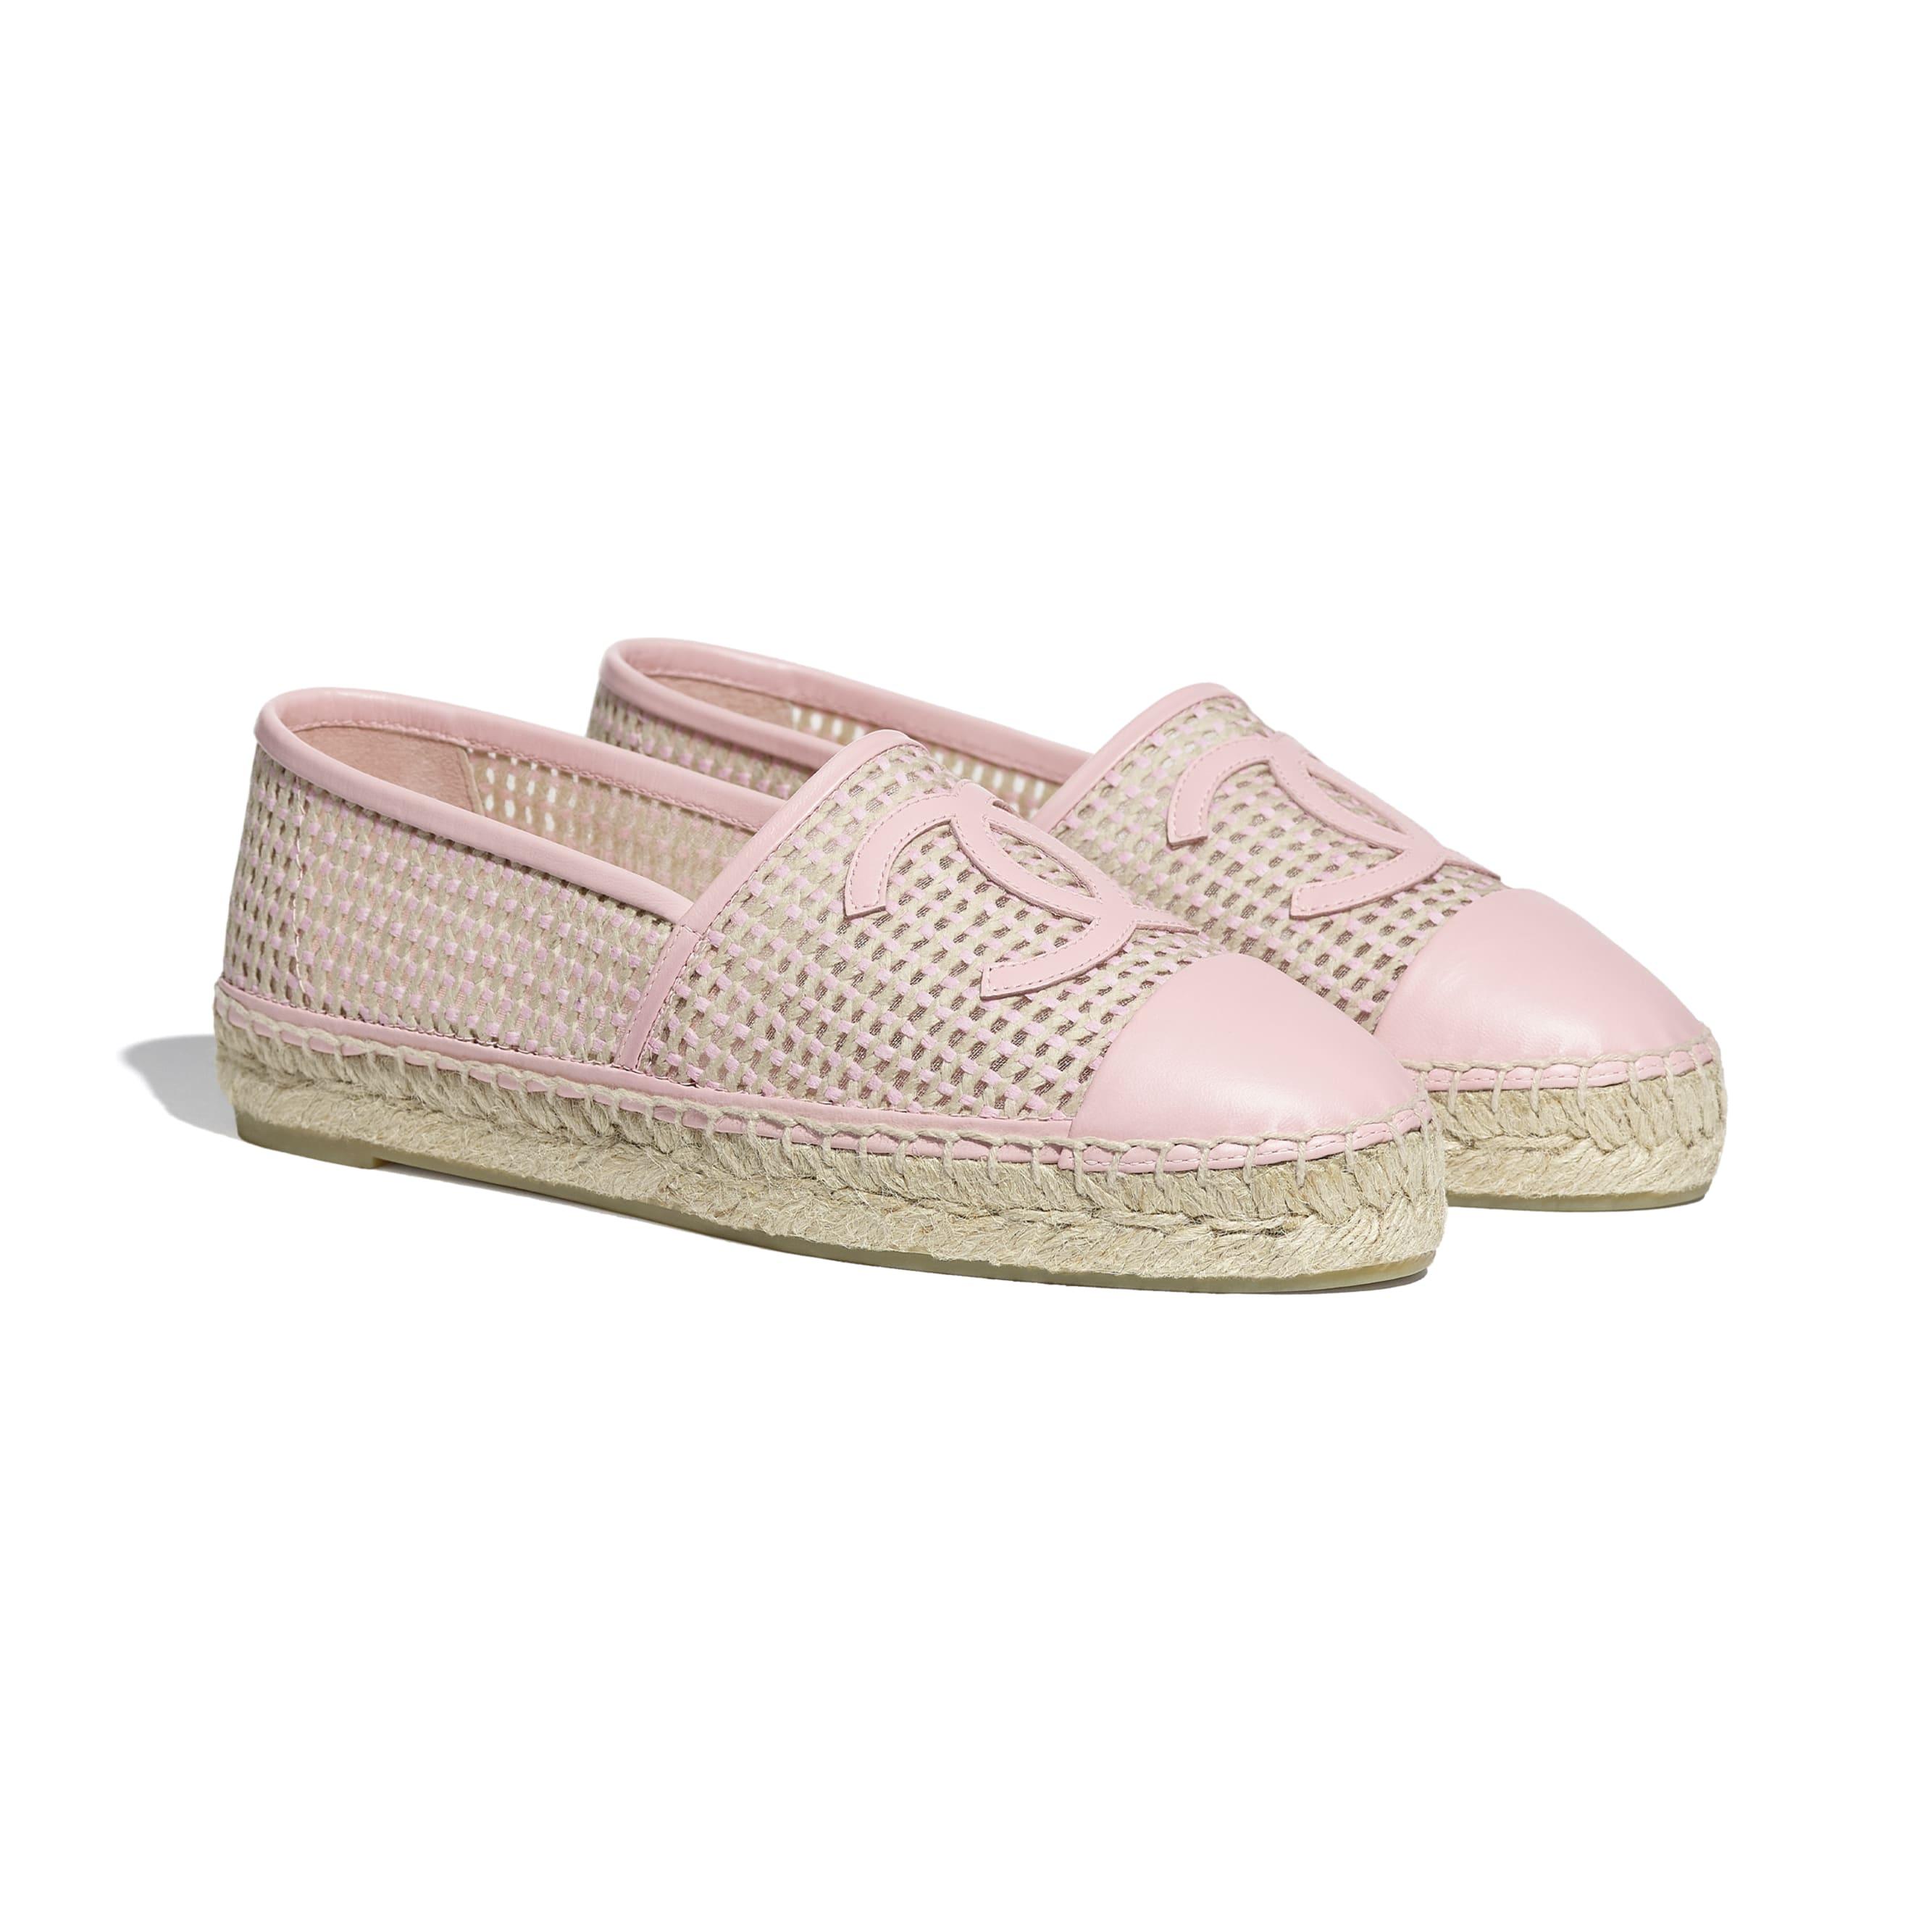 Espadrilles - Light Pink & Beige - Mesh & Lambskin - CHANEL - Alternative view - see standard sized version